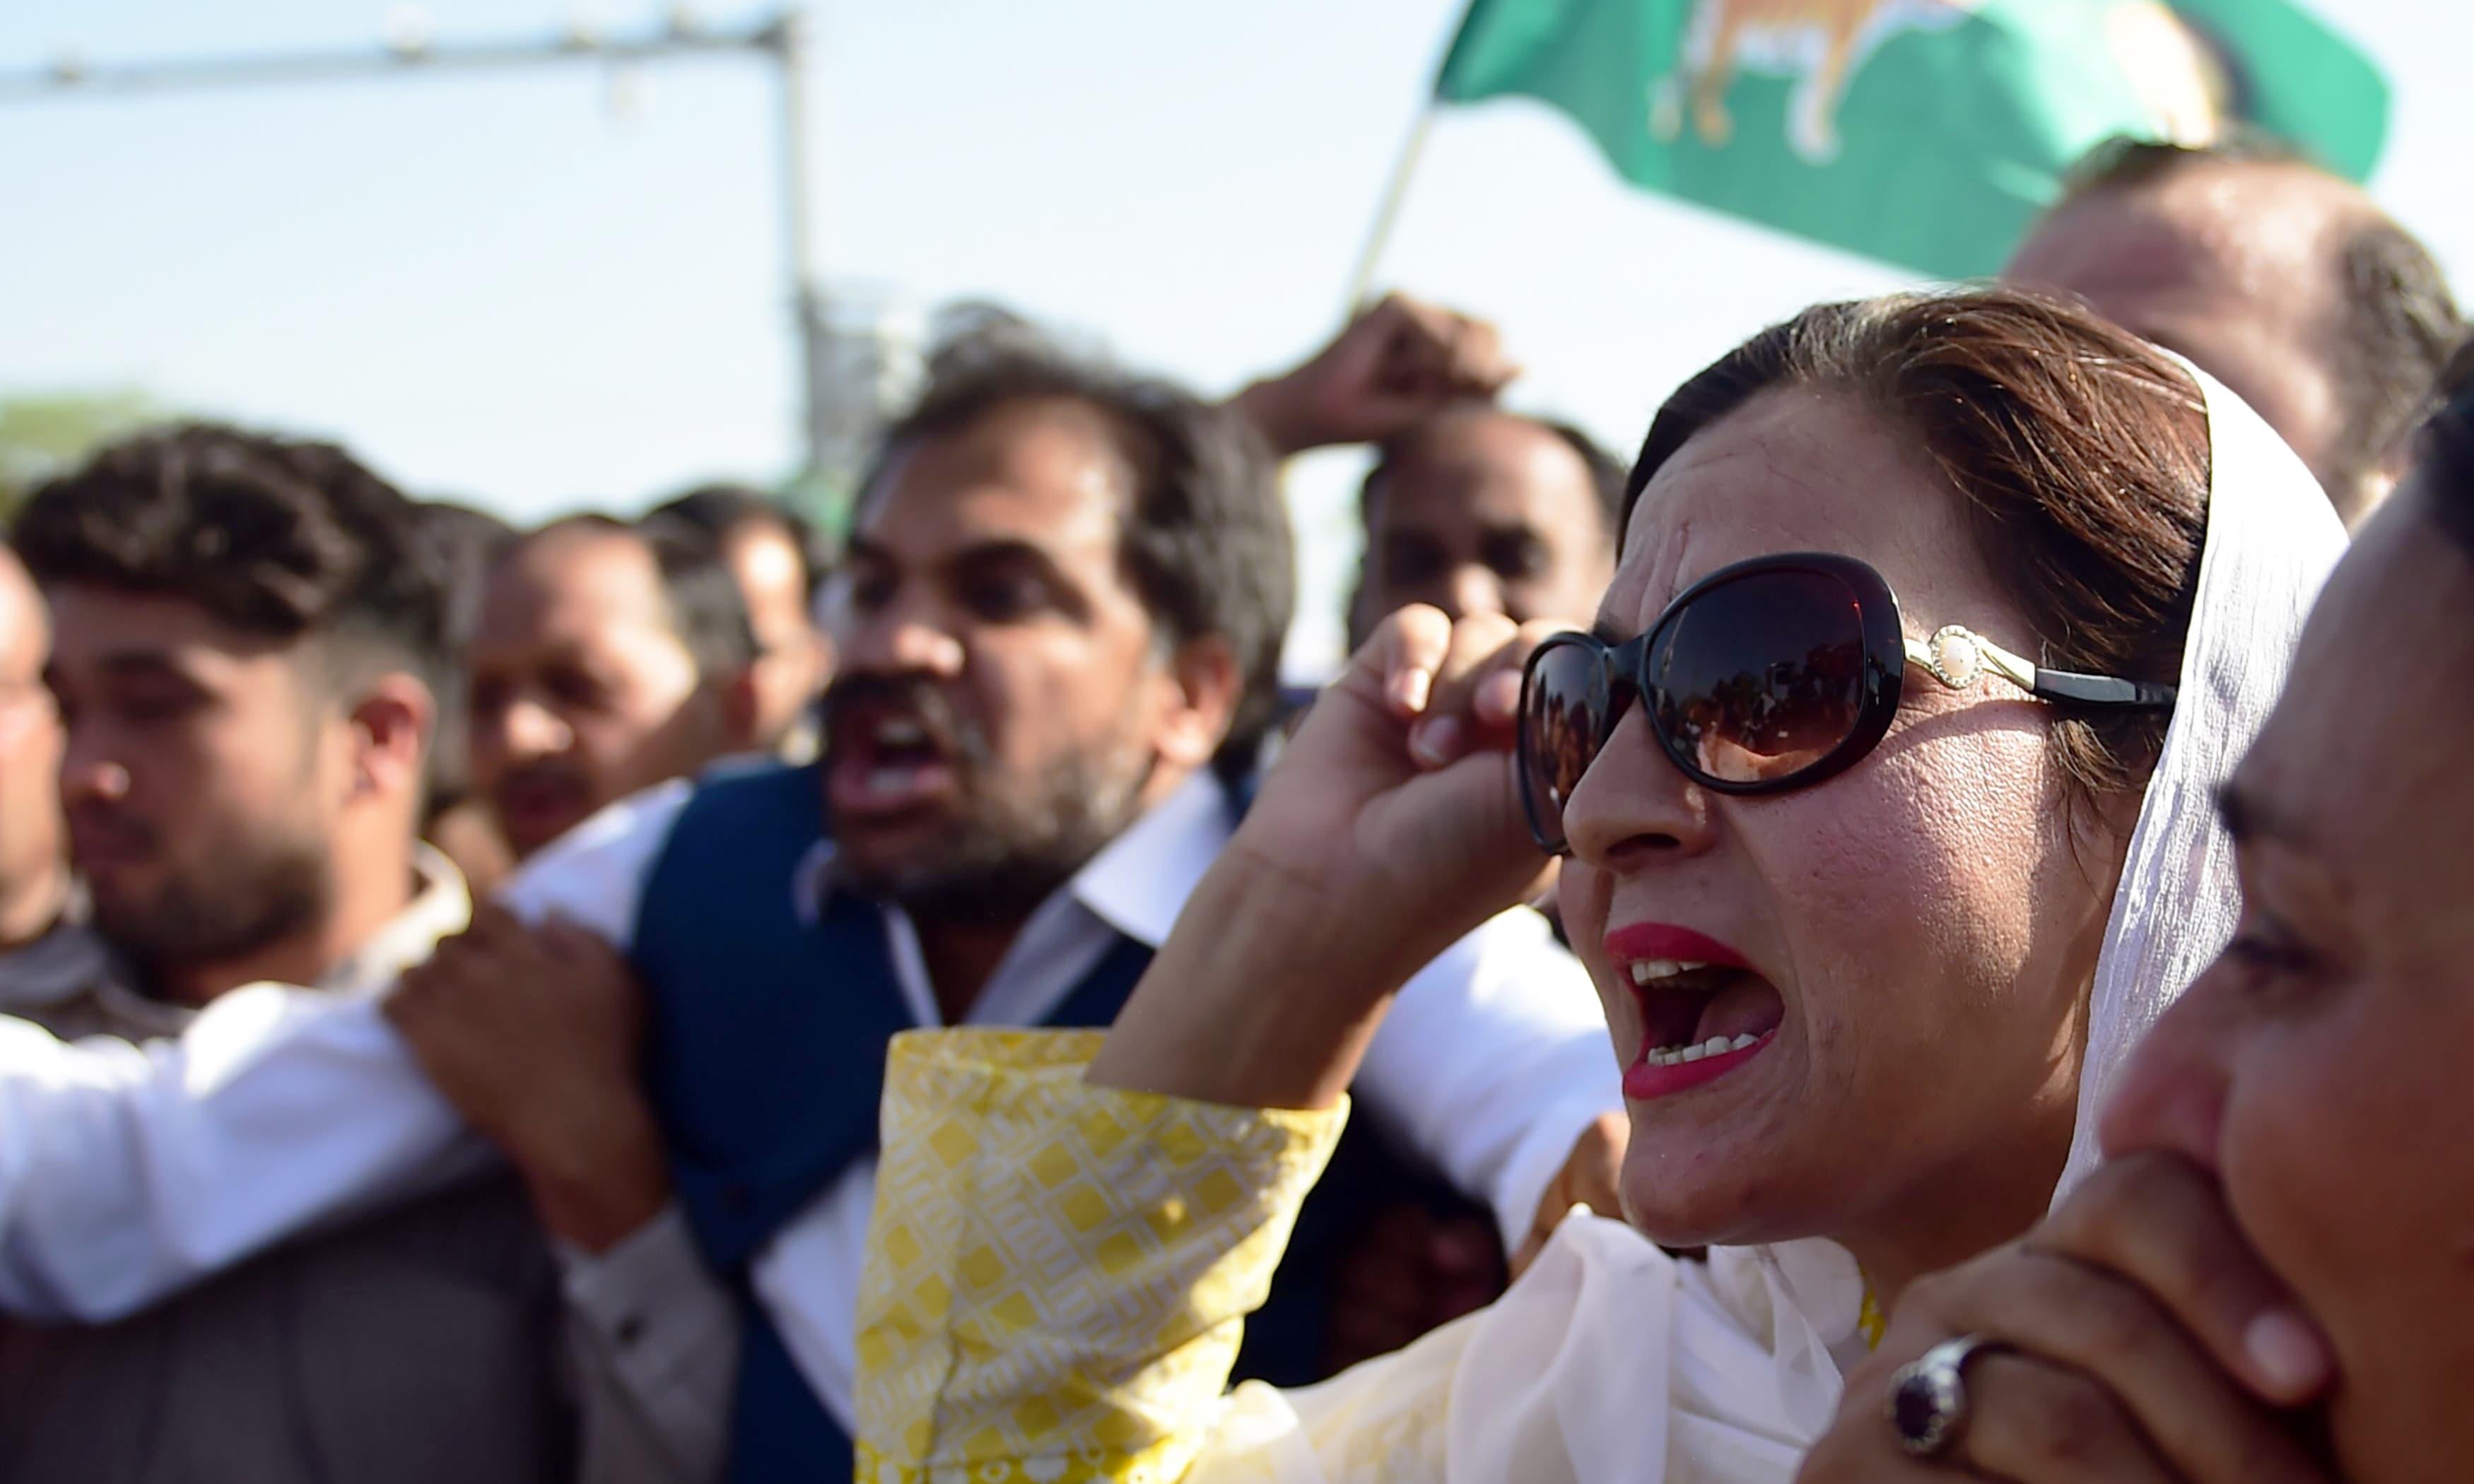 PML-N activists shout slogans outside court after the sentencing of former prime minister Nawaz Sharif in Islamabad.—AFP